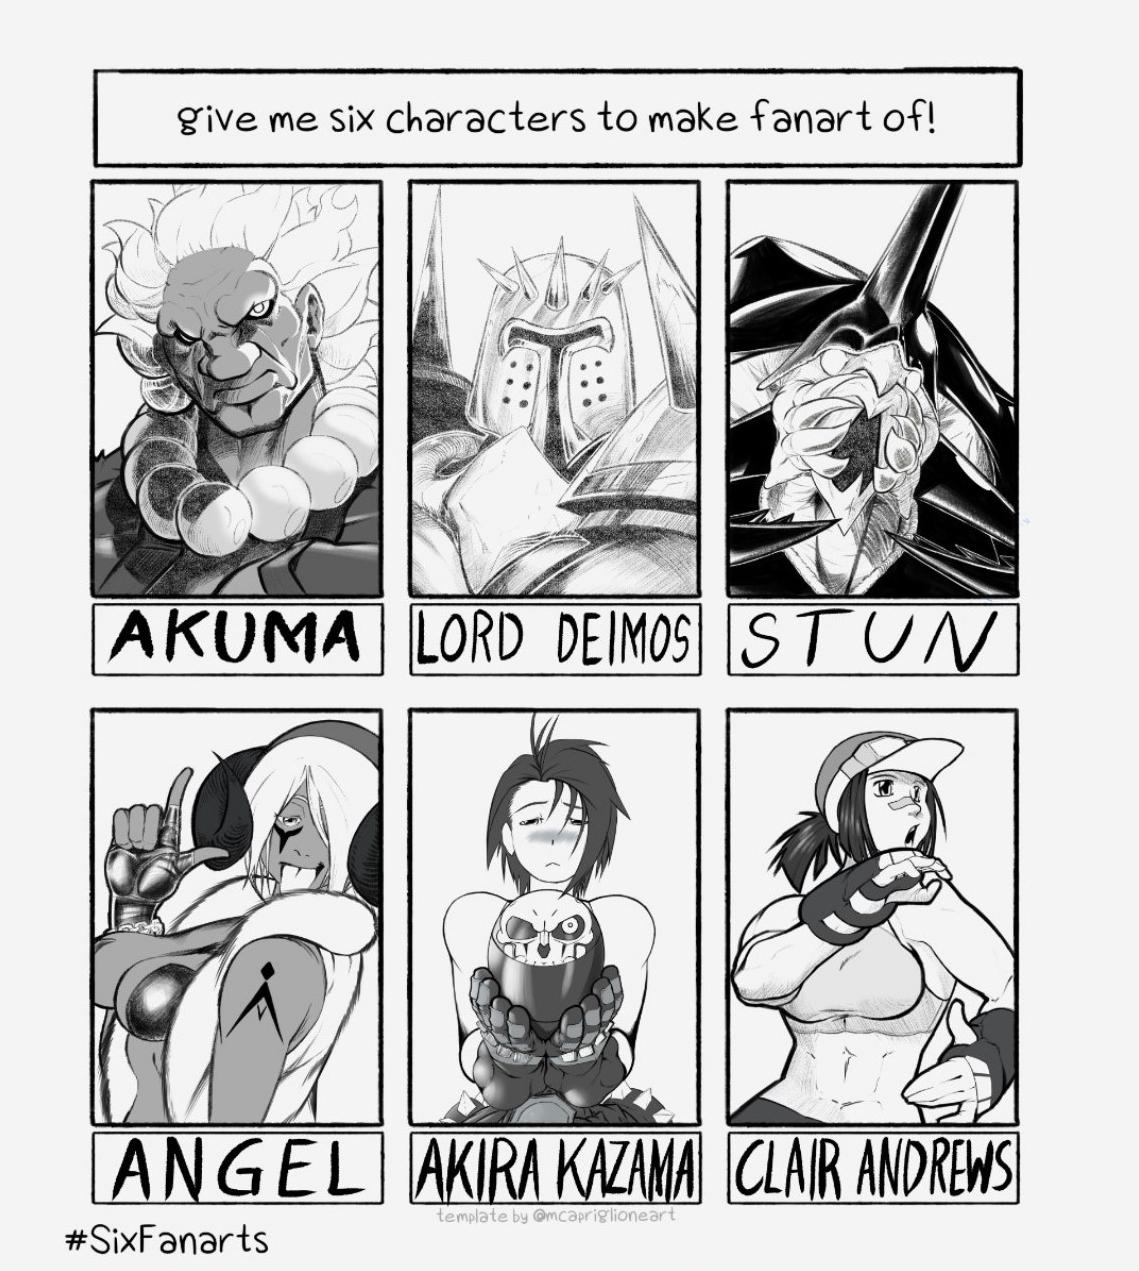 Six Fanarts Meme: Fighting Game Edition!!!